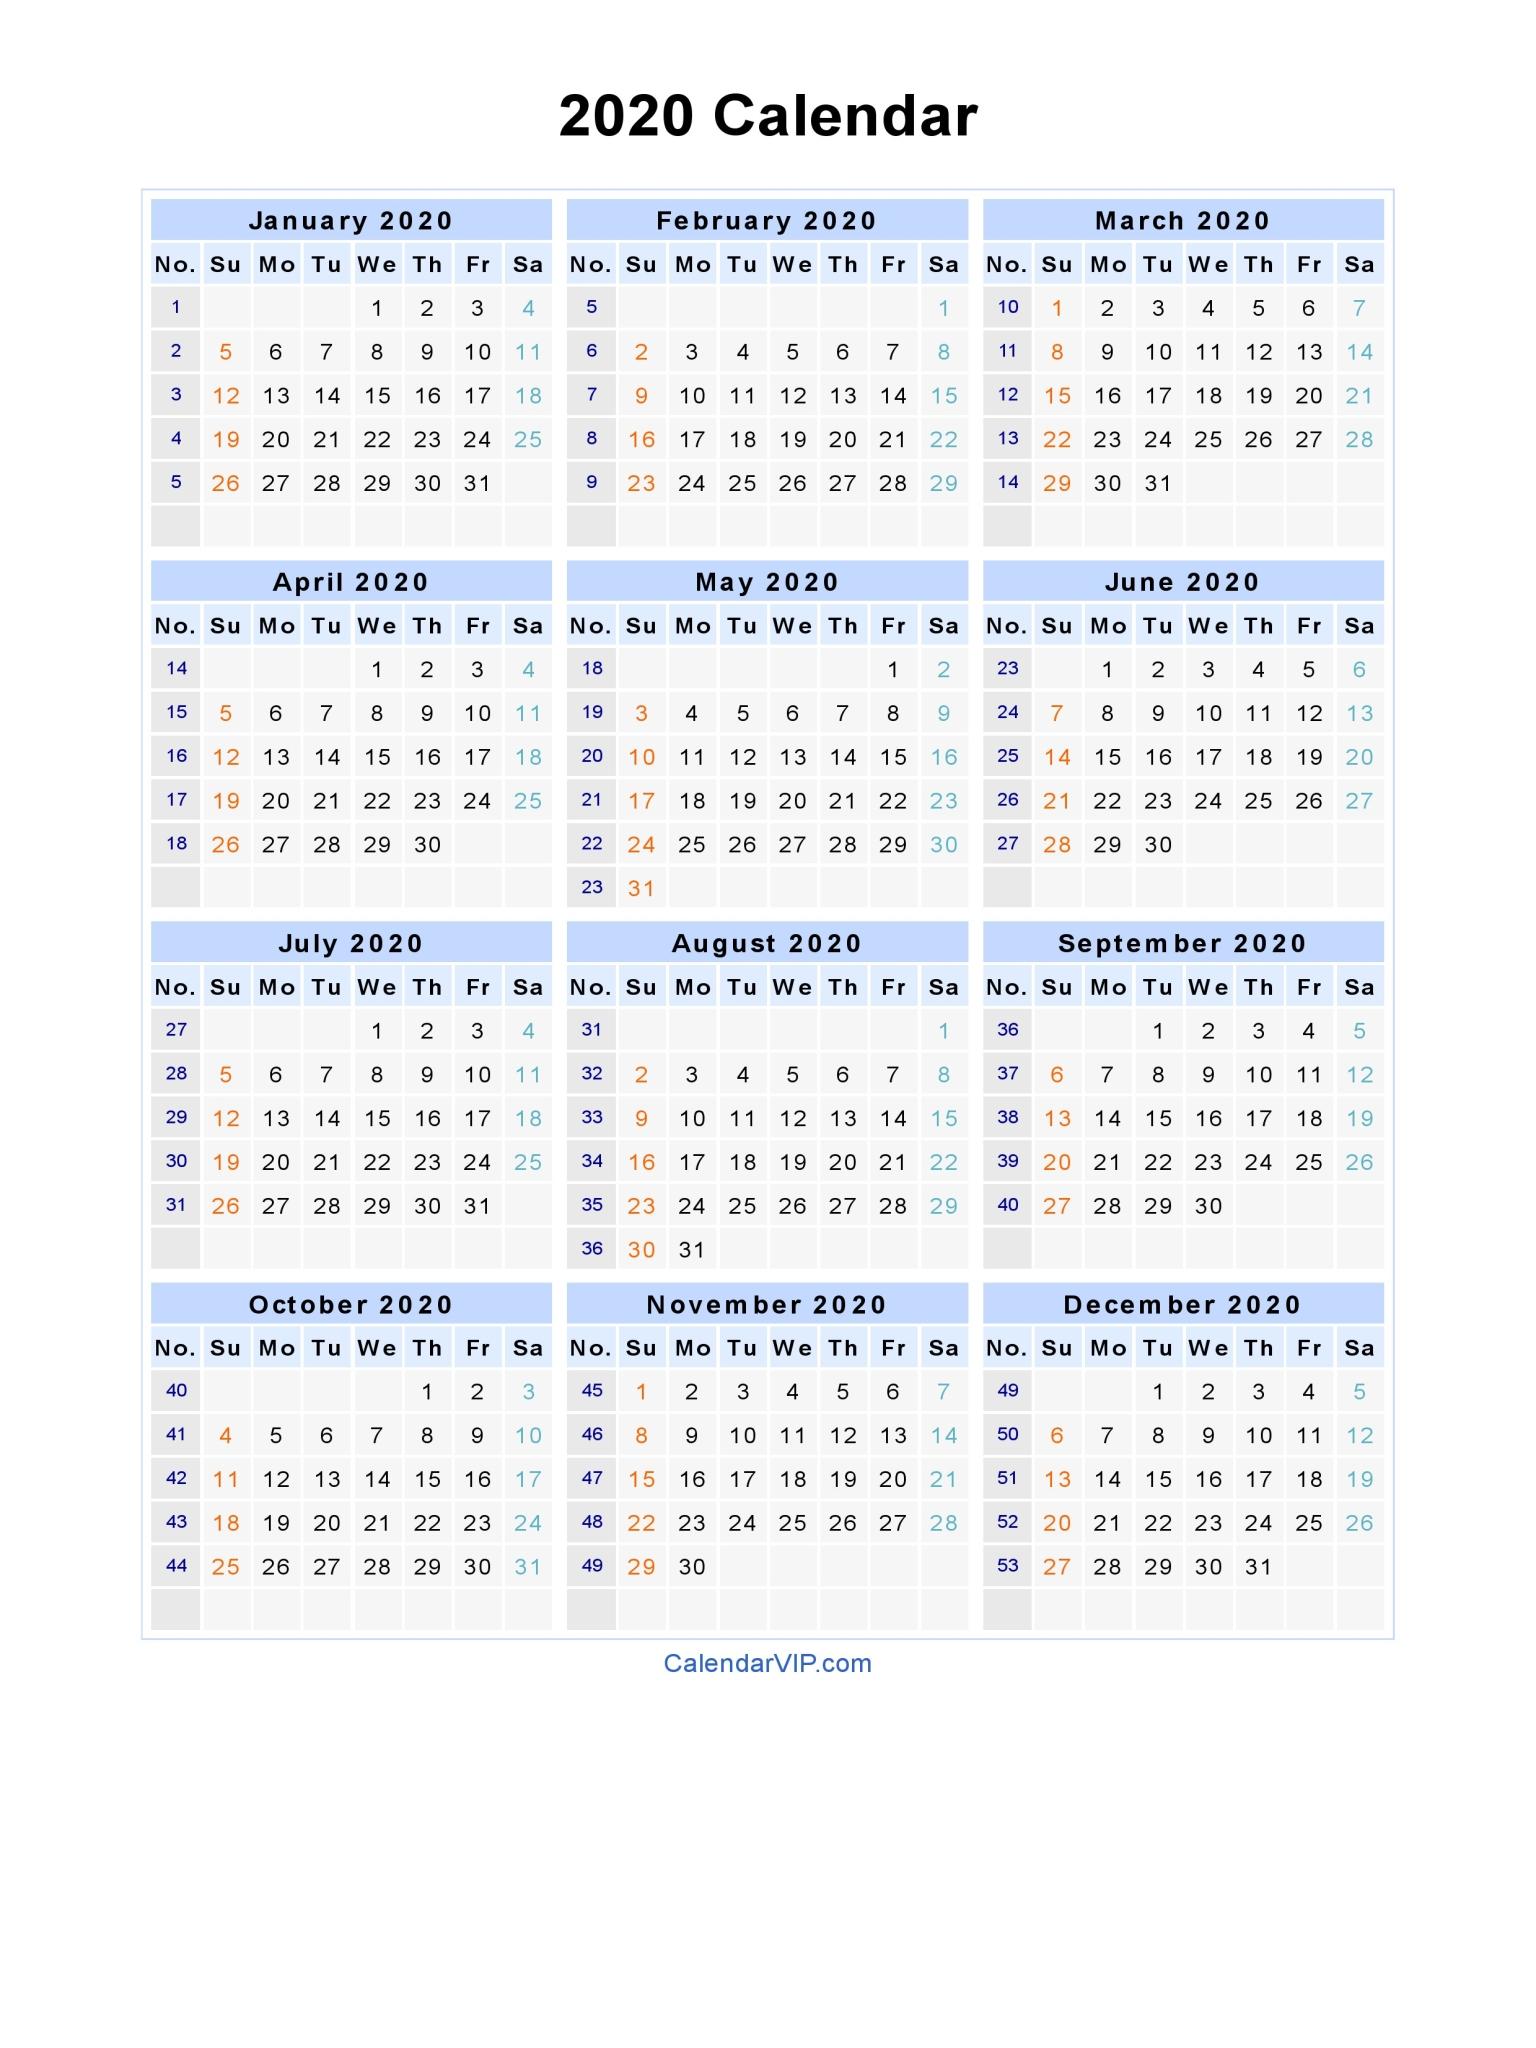 2020 Calendar - Blank Printable Calendar Template In Pdf Word Excel regarding 2020 Calender I Can Edit